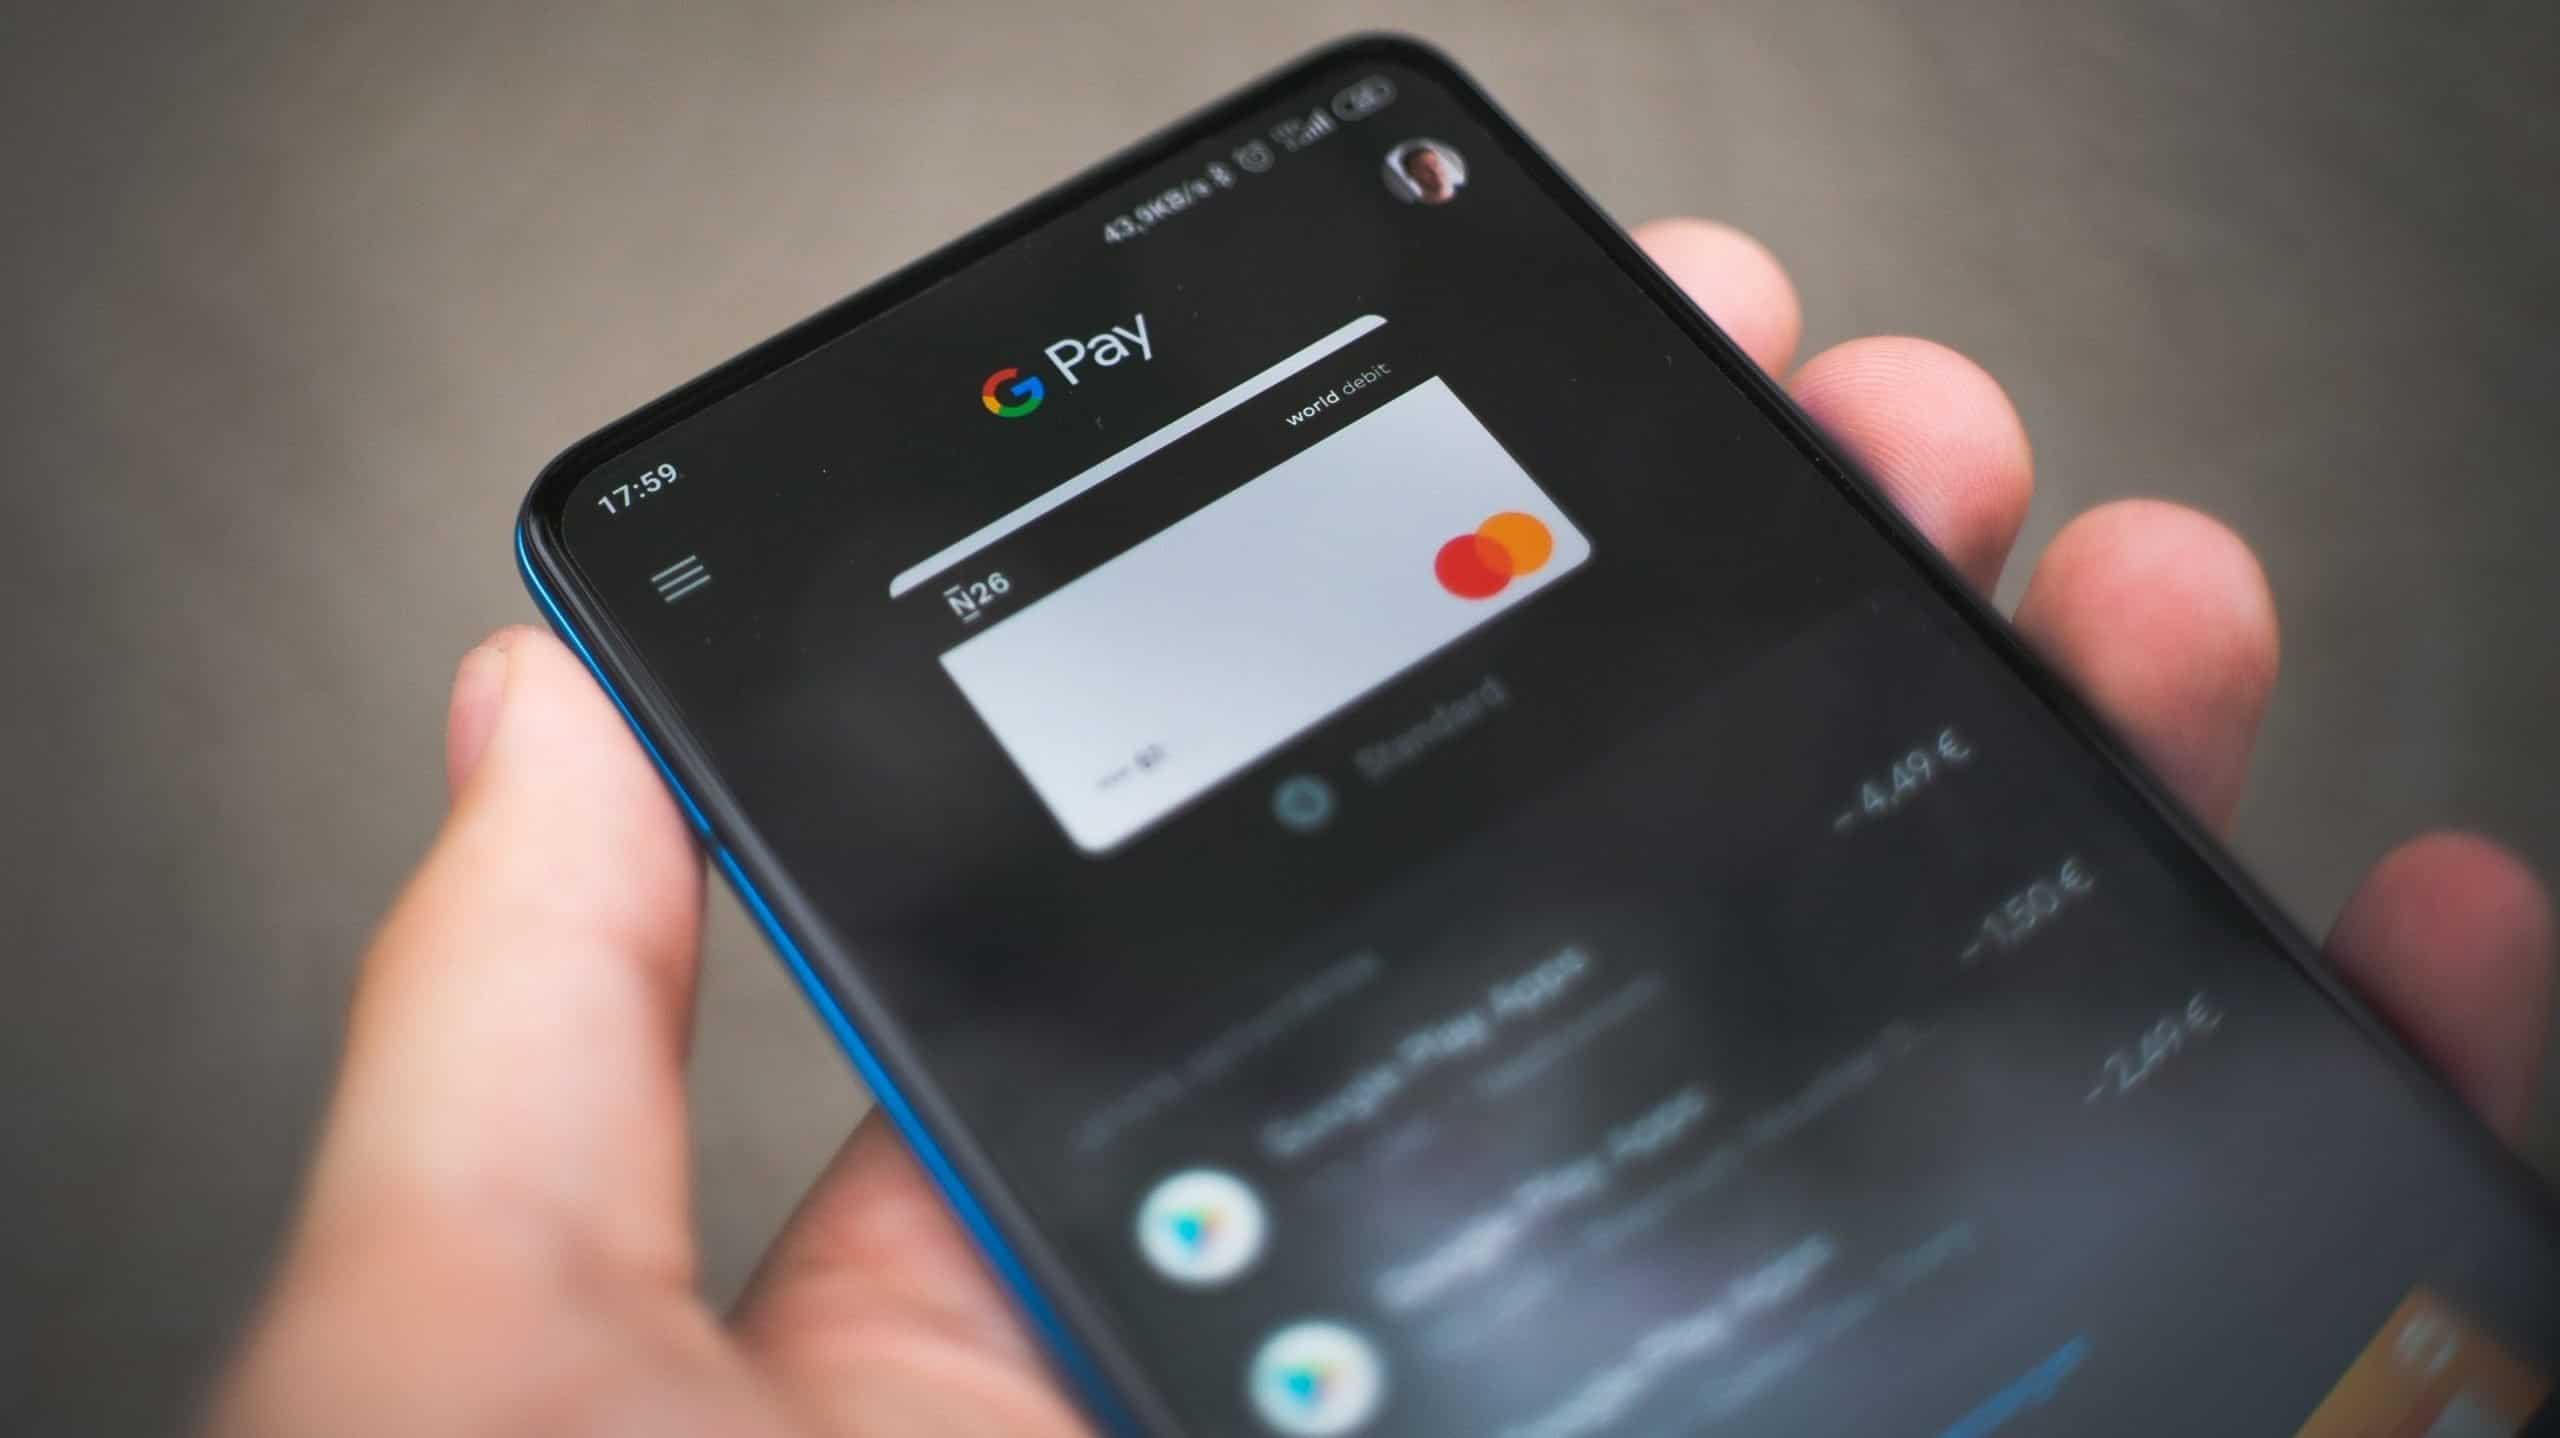 Mobil m. G-pay. Starte webshop. Hvilken betalingsløsning til netbutik. Rene Sejling.